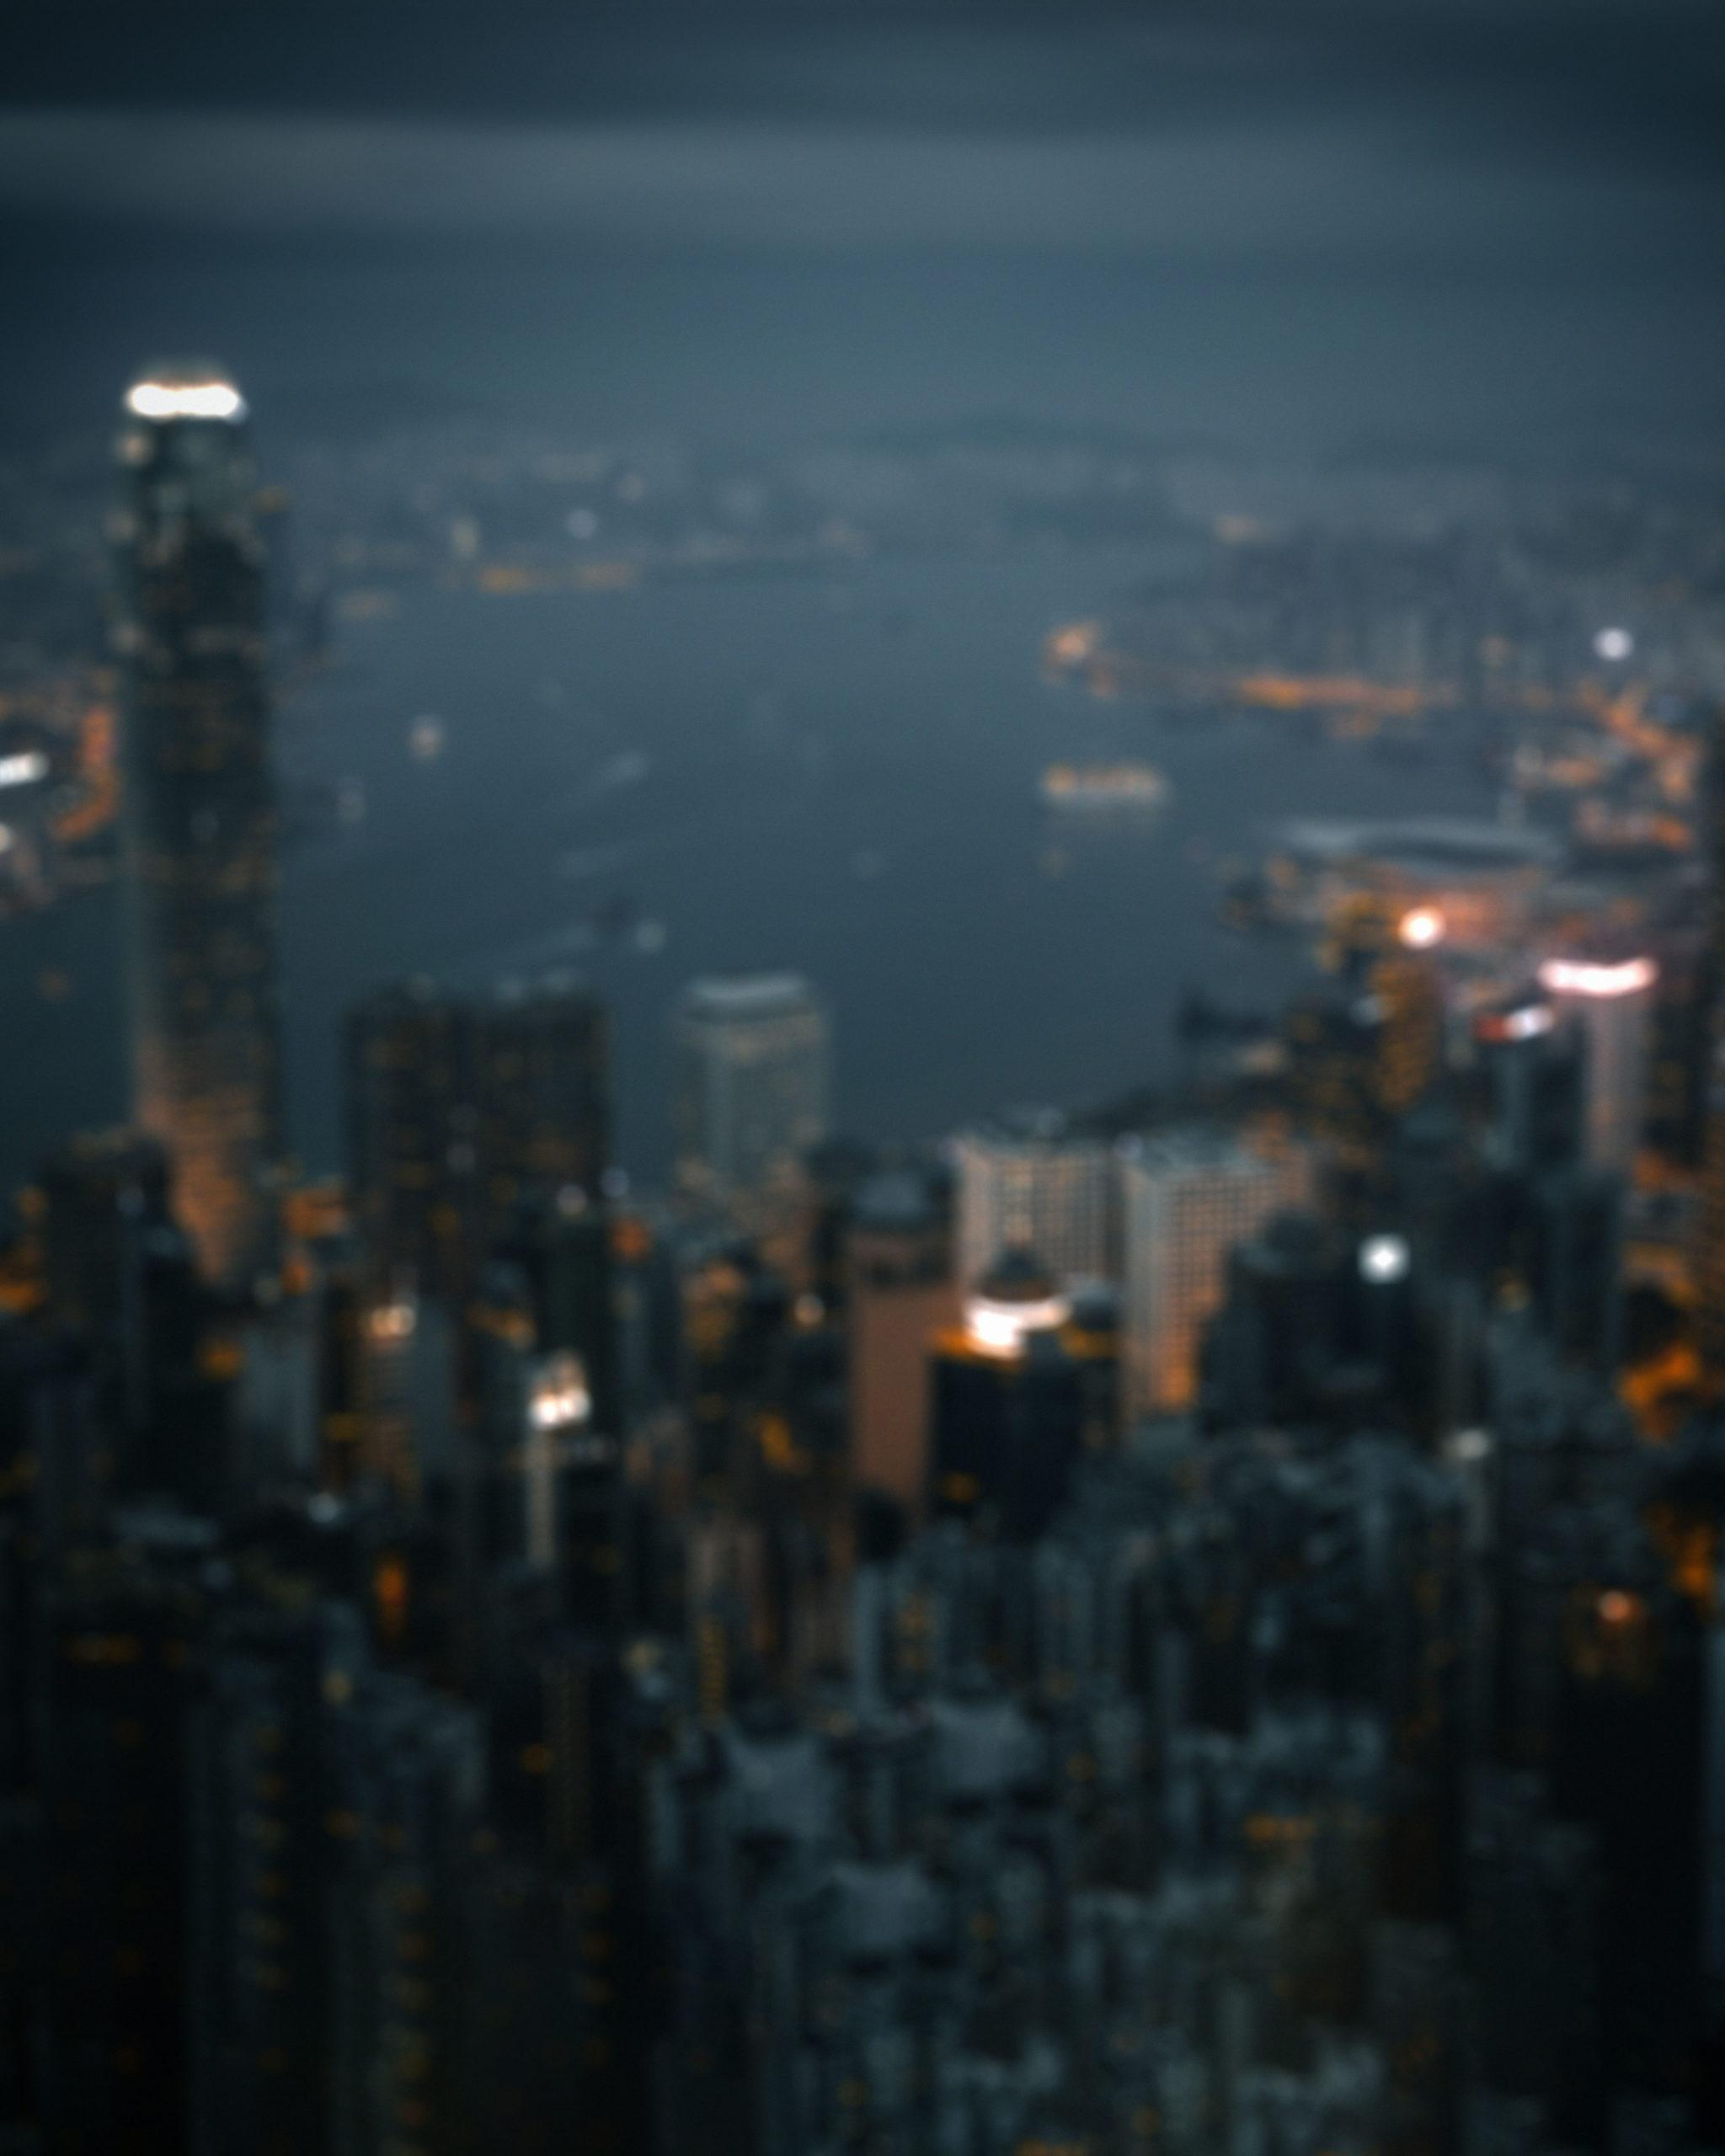 city night background